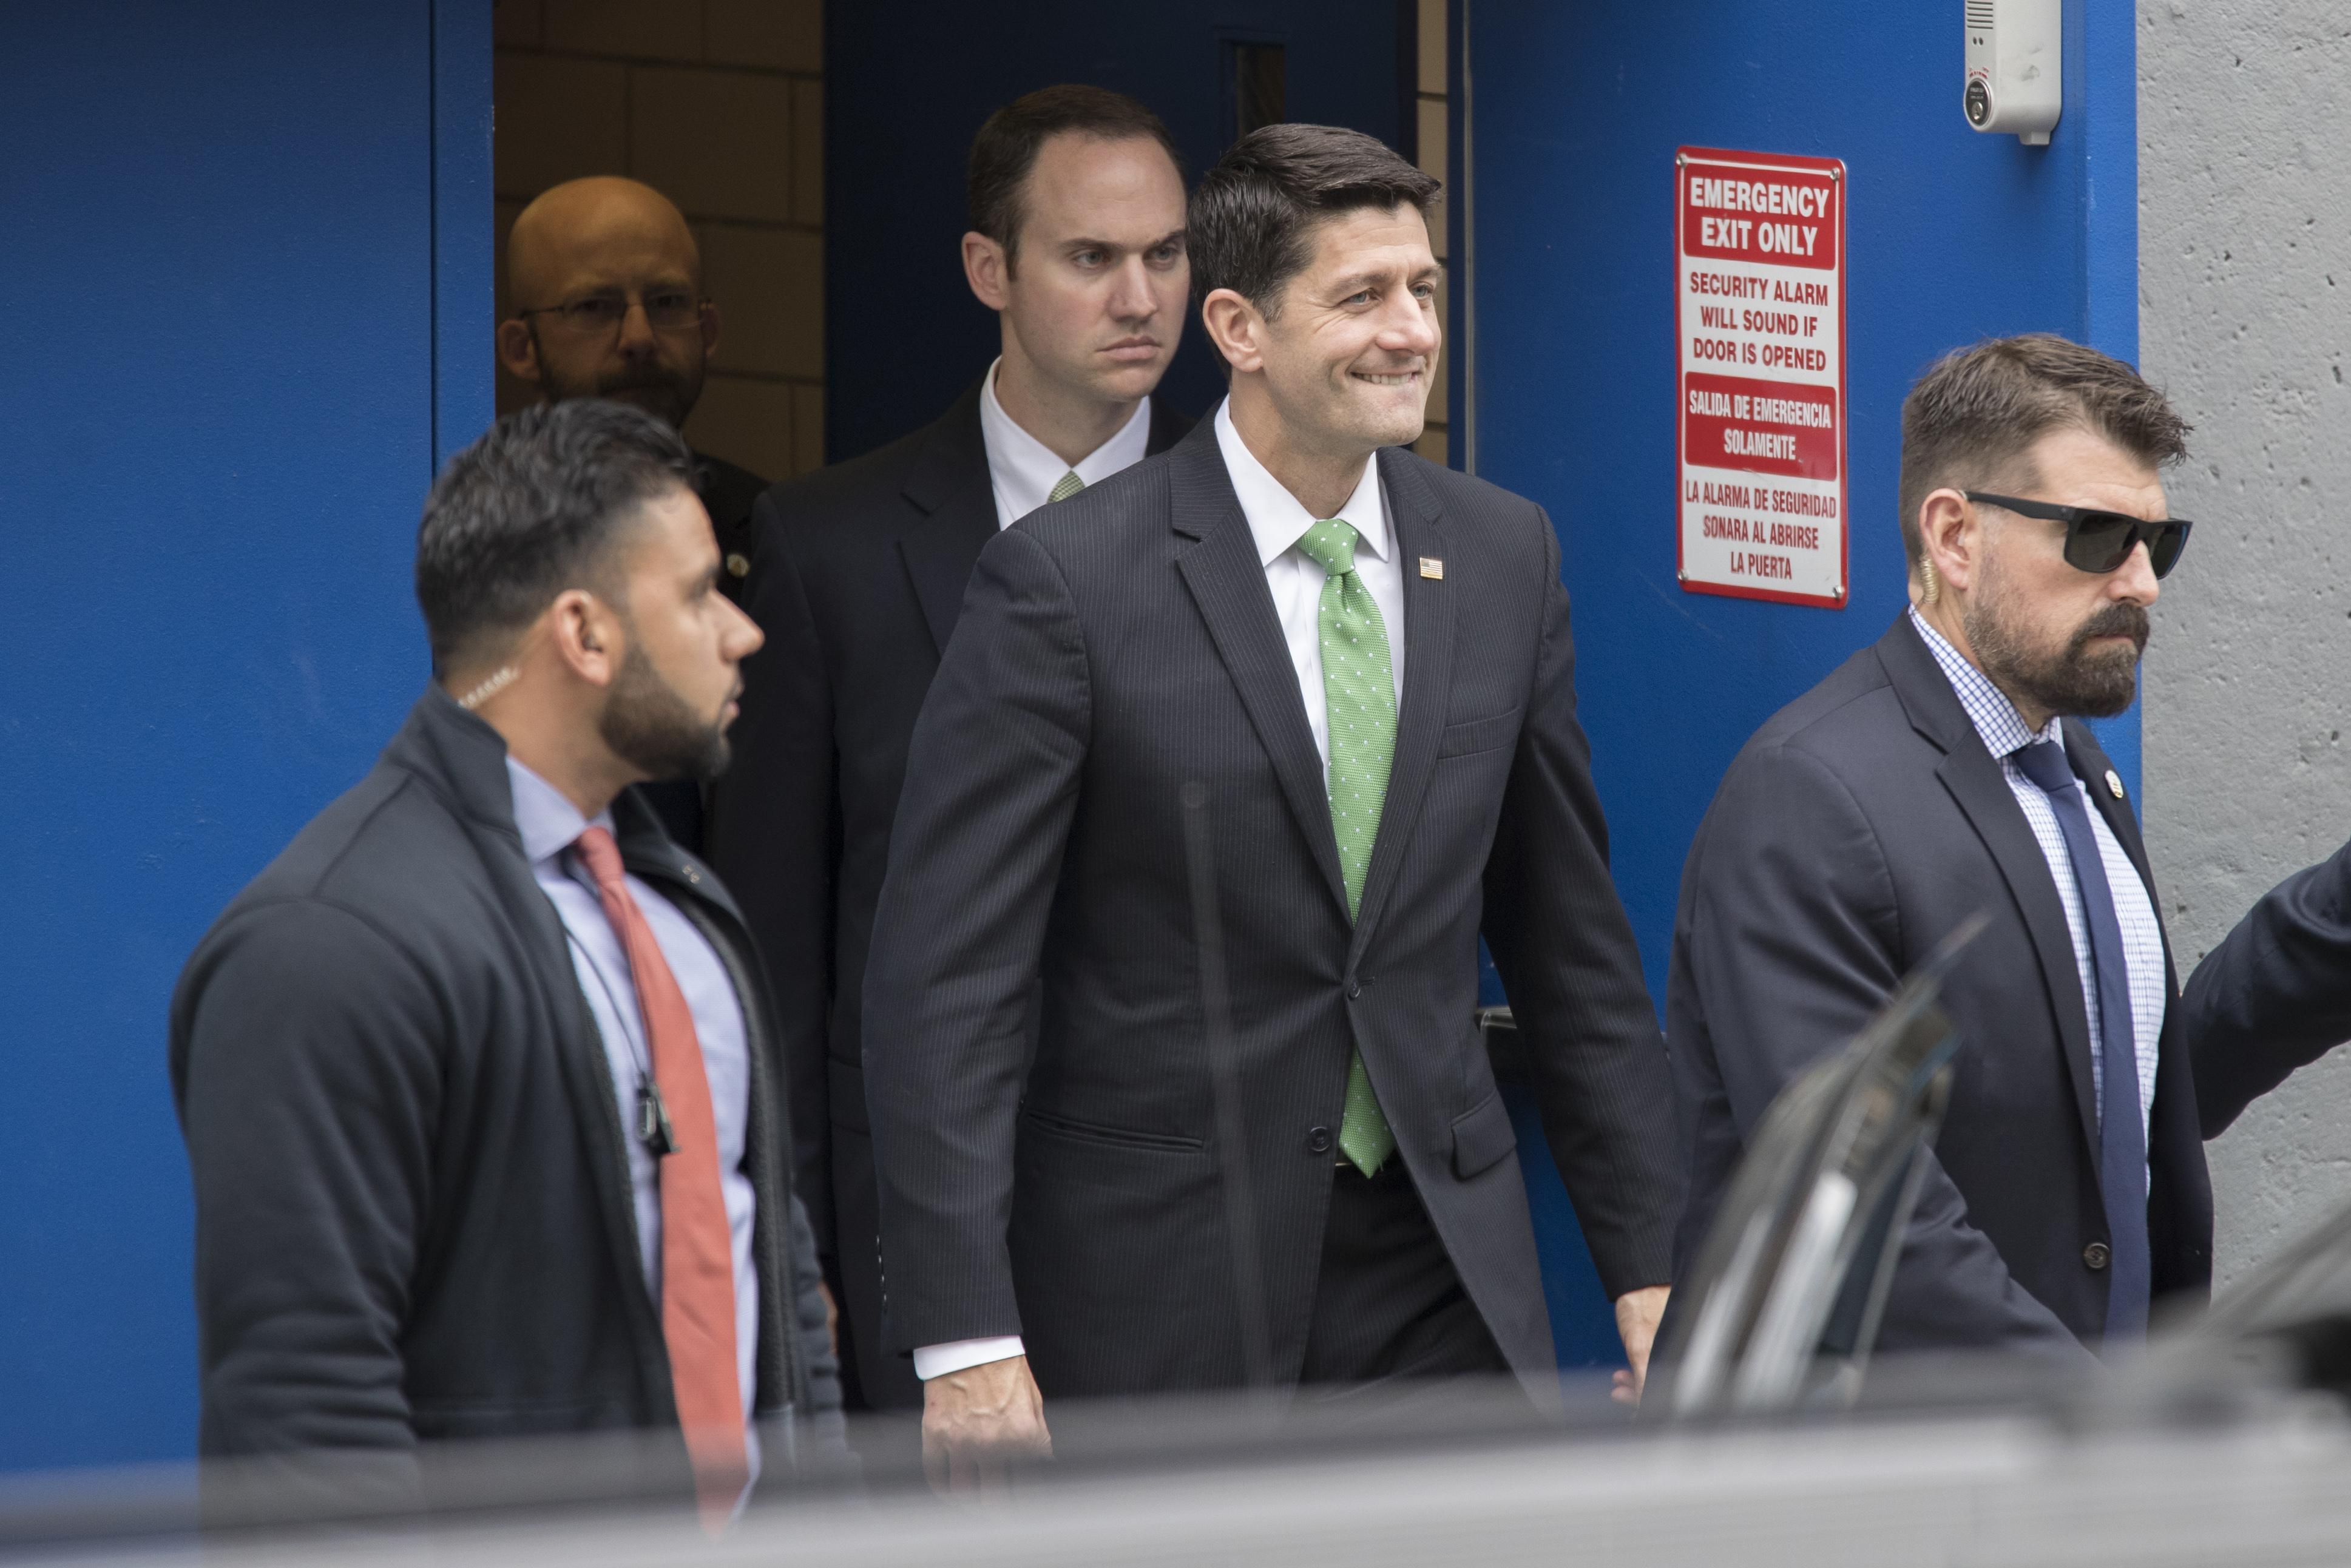 Paul Ryan visits New York school run by charter advocate - Washington Times